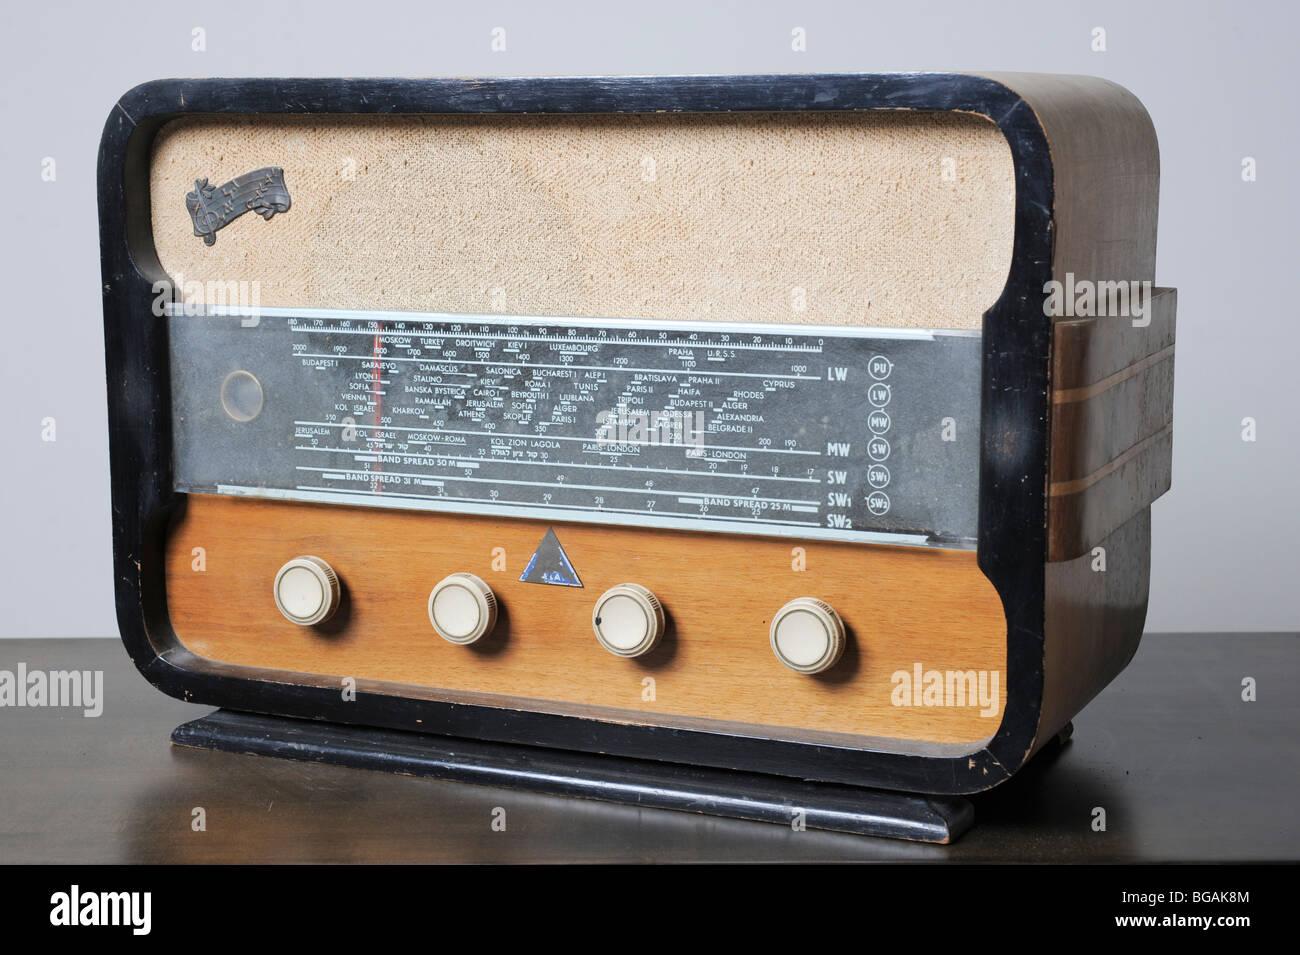 Cutout of an Israeli made Galai radio receiver on white background Stock Photo